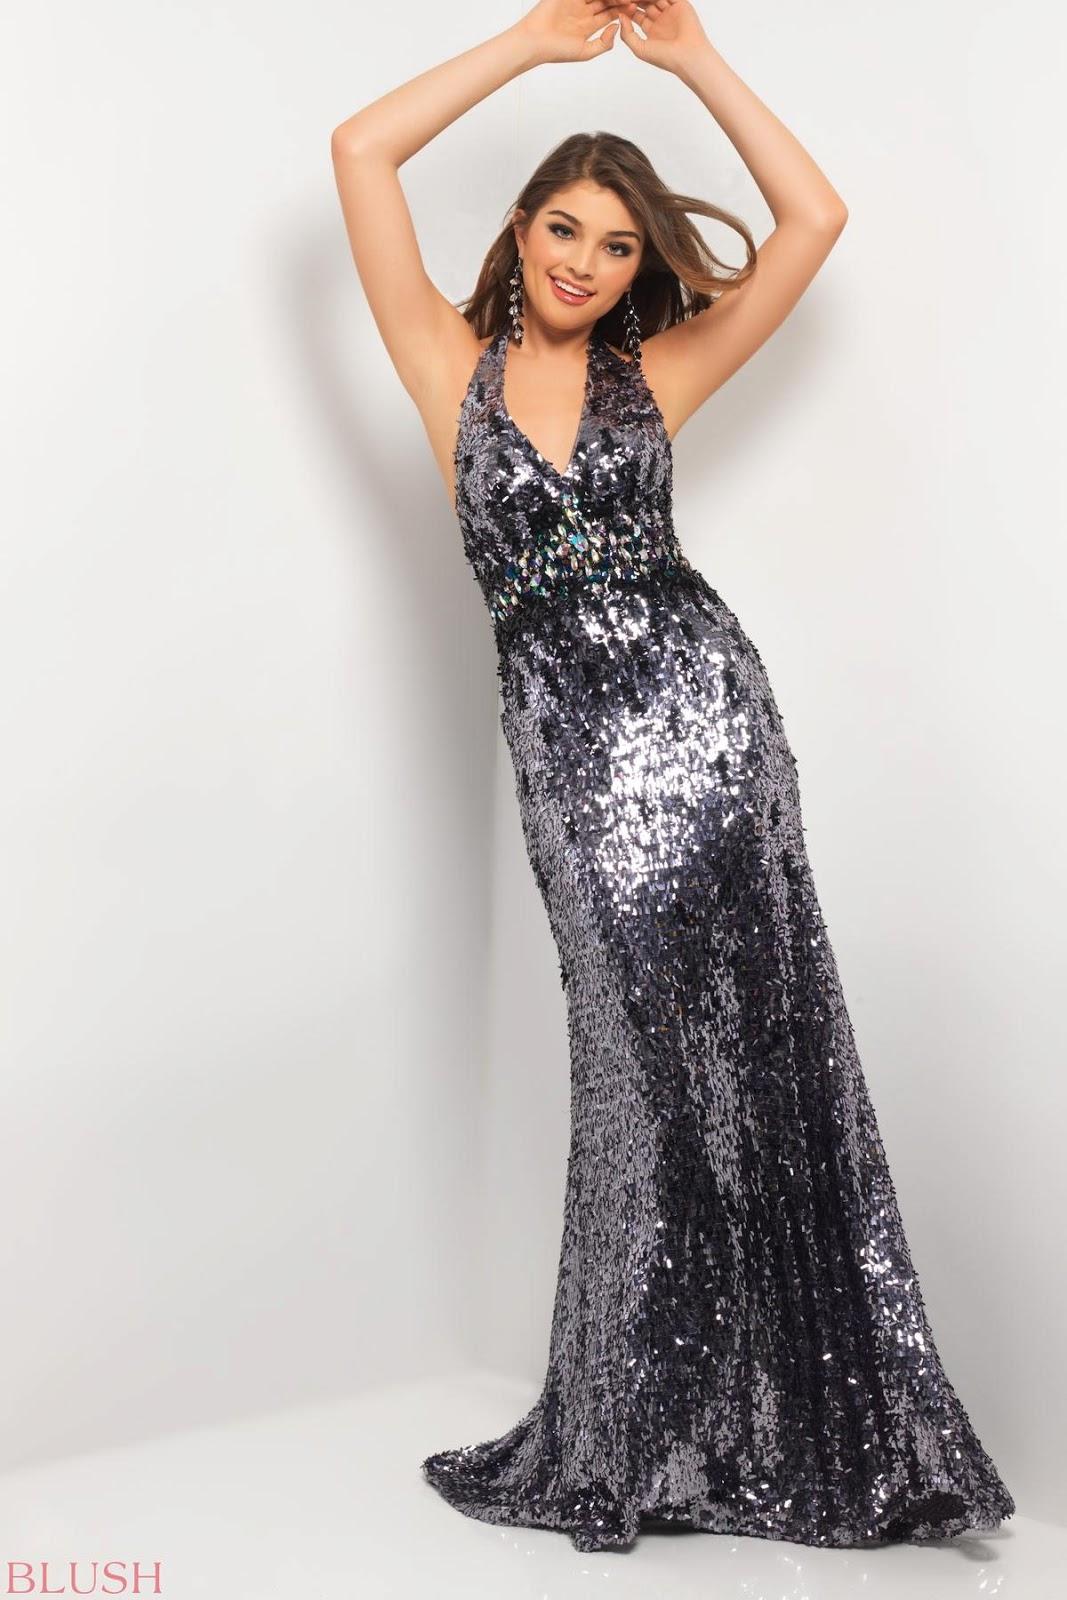 Blush Prom Fashion Party Prom Dresses Online Blog